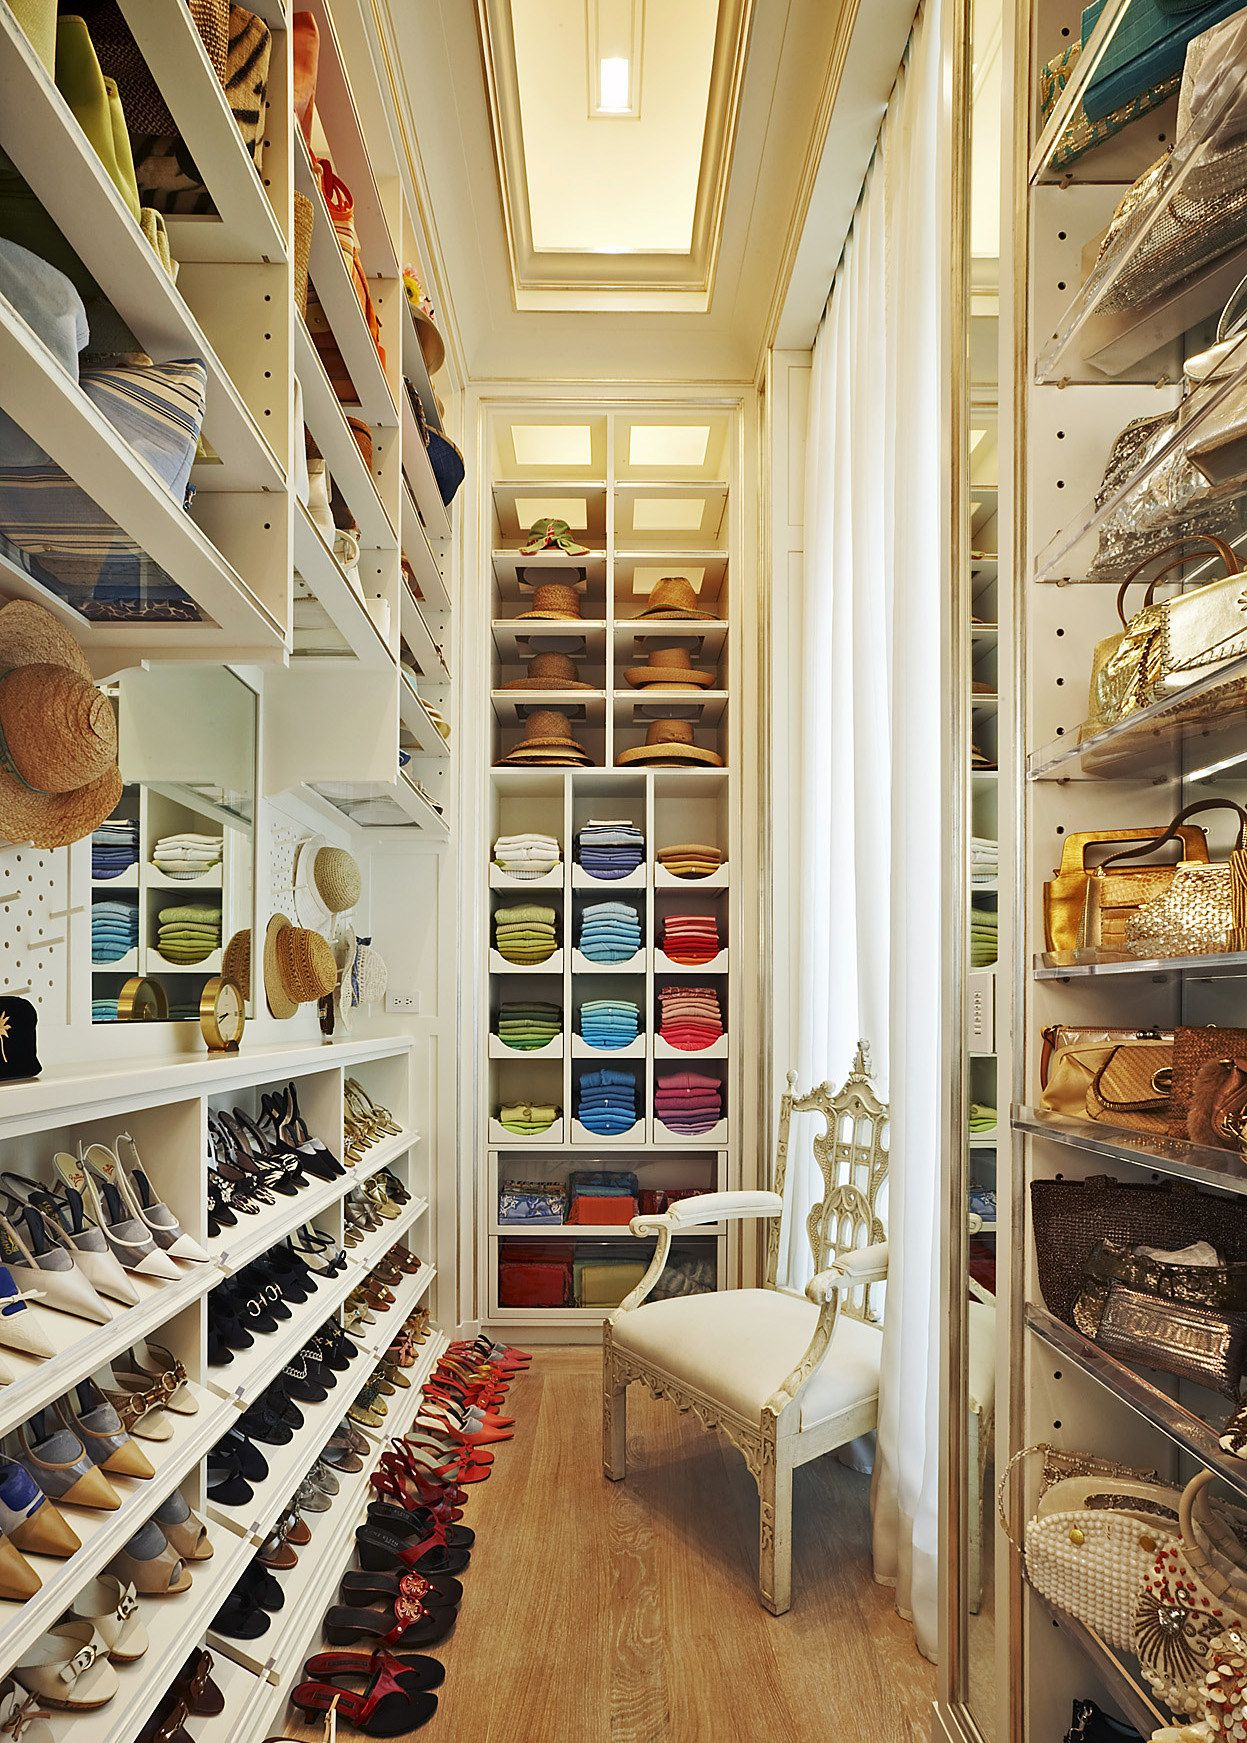 Closet Organization Ideas And Tips By Custom Closet Designer Melanie  Charlton Photos | Architectural Digest